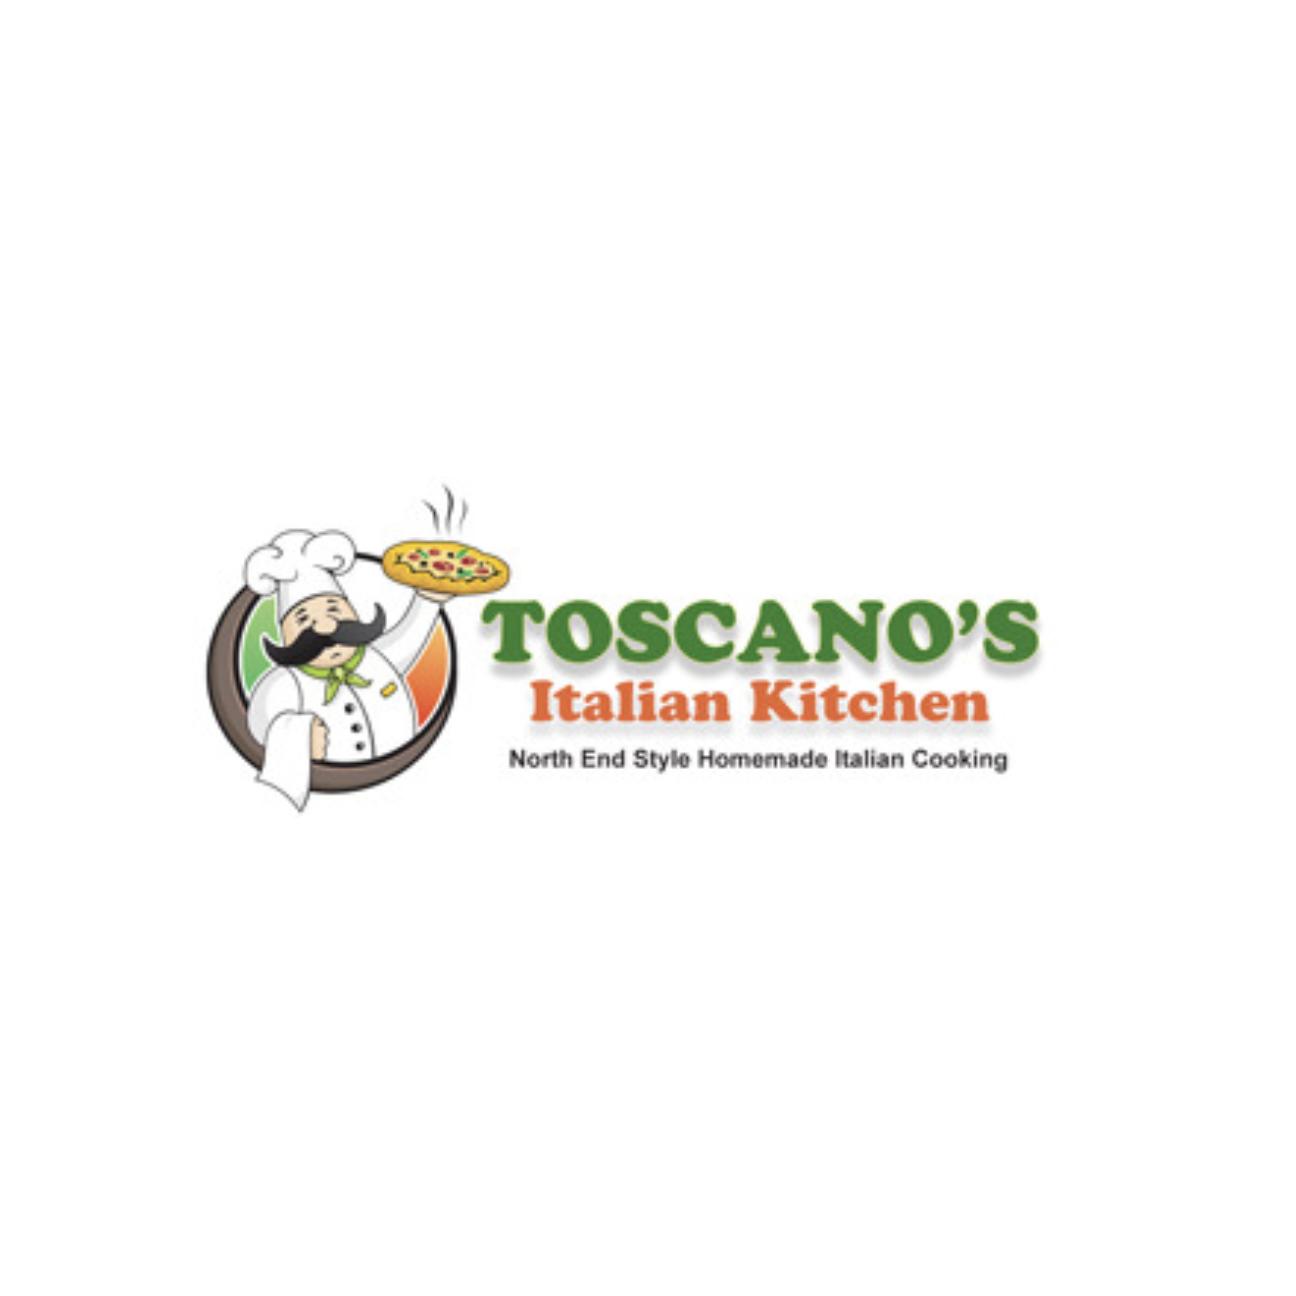 Toscano's Italian Kitchen image 6